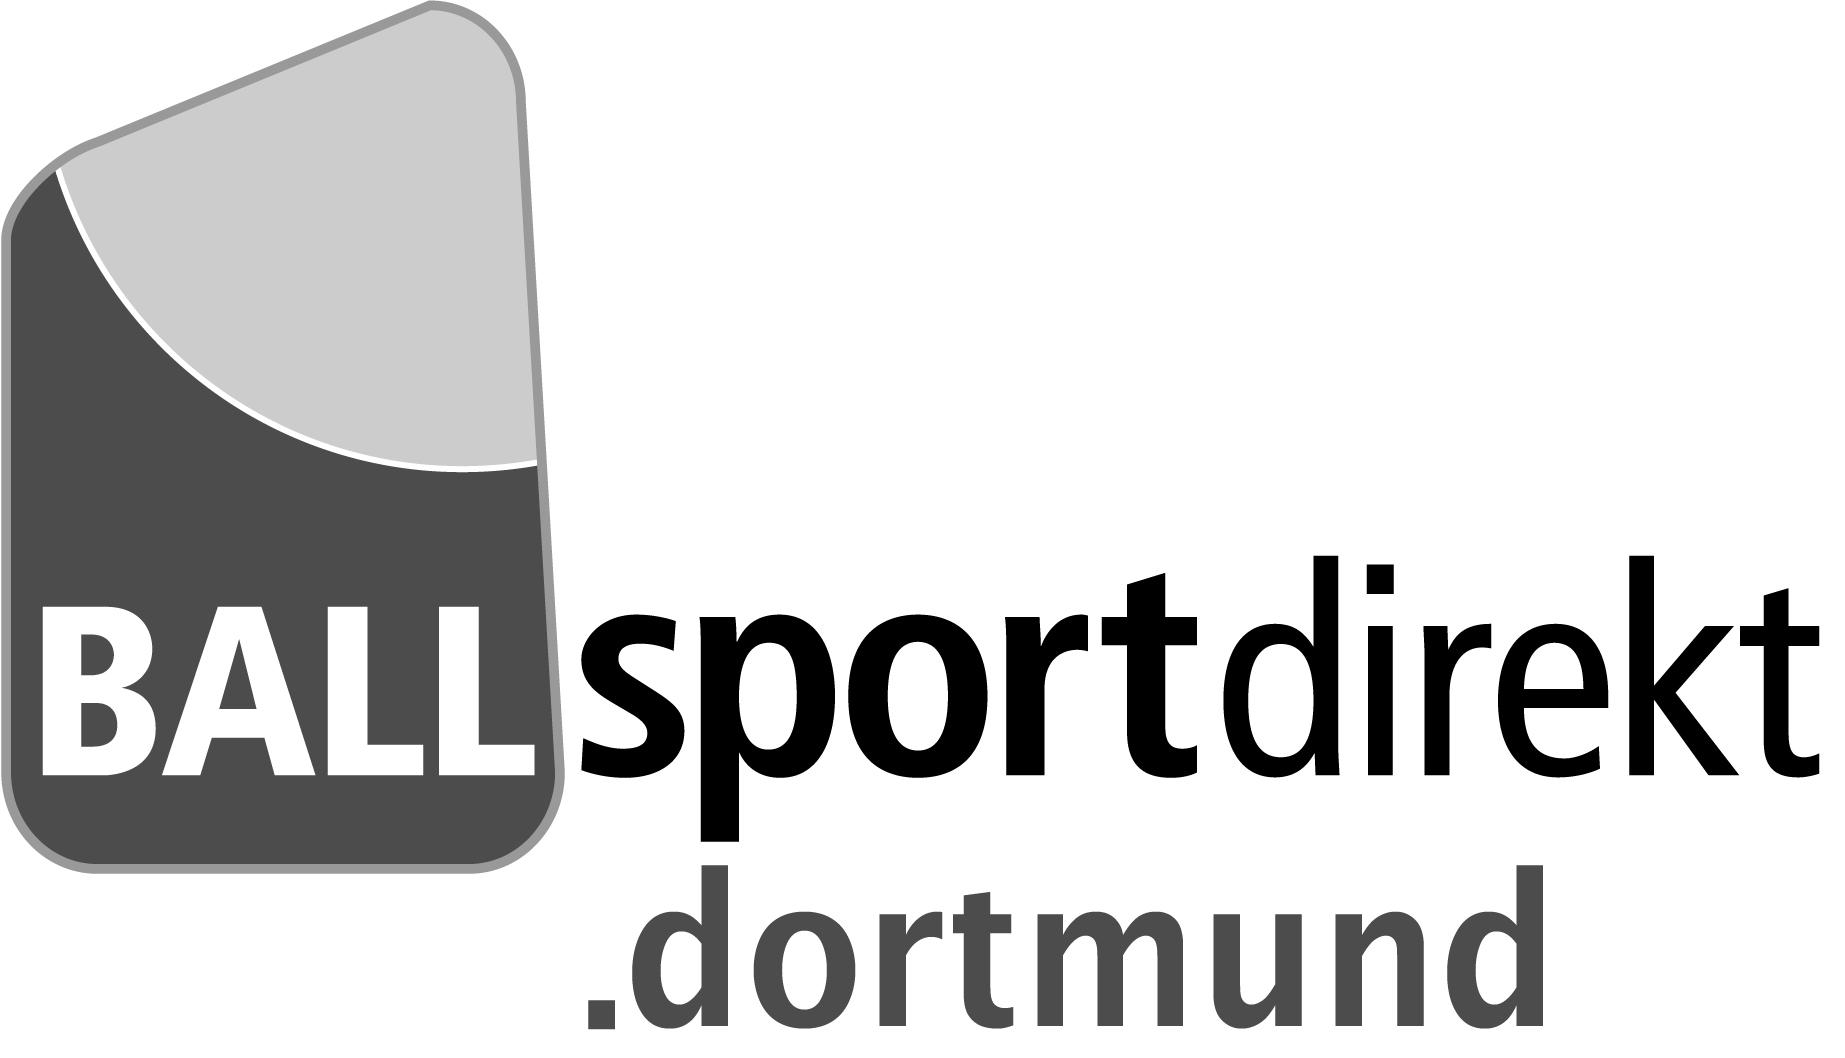 Ballsport.dortmund